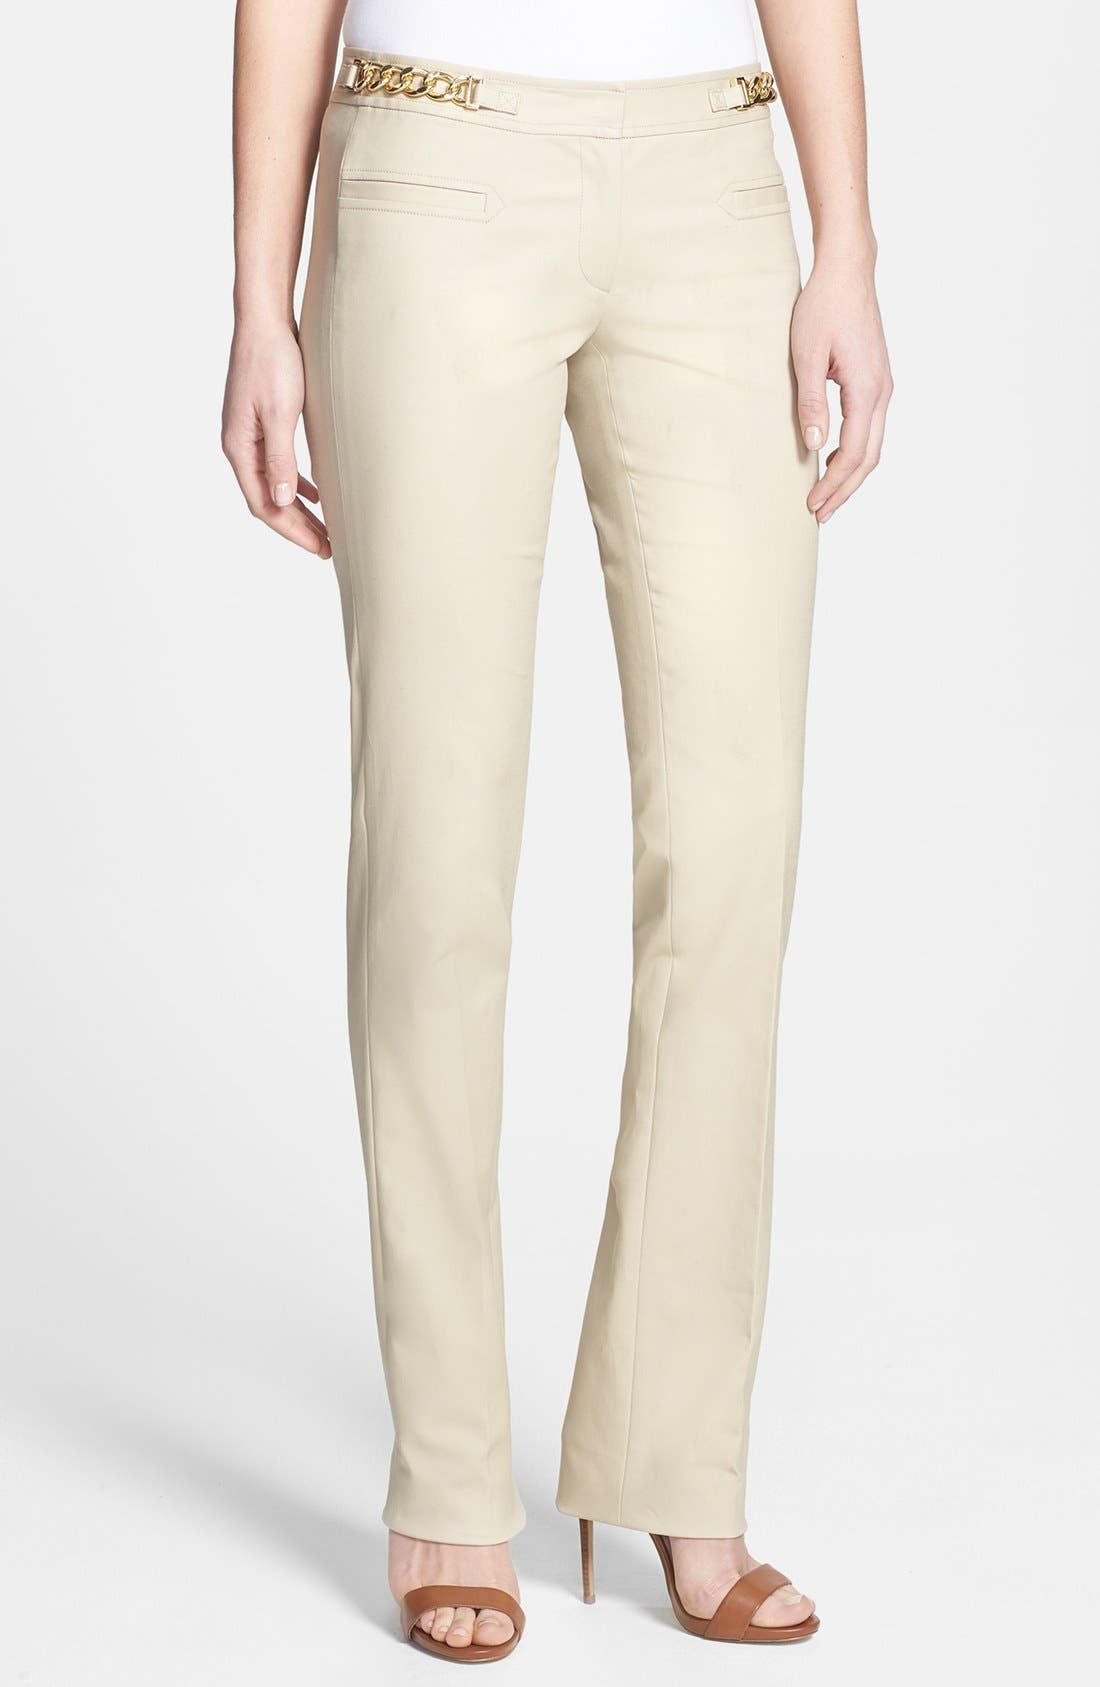 Main Image - MICHAEL Michael Kors 'Sexy' Hardware Detail Stretch Cotton Pants